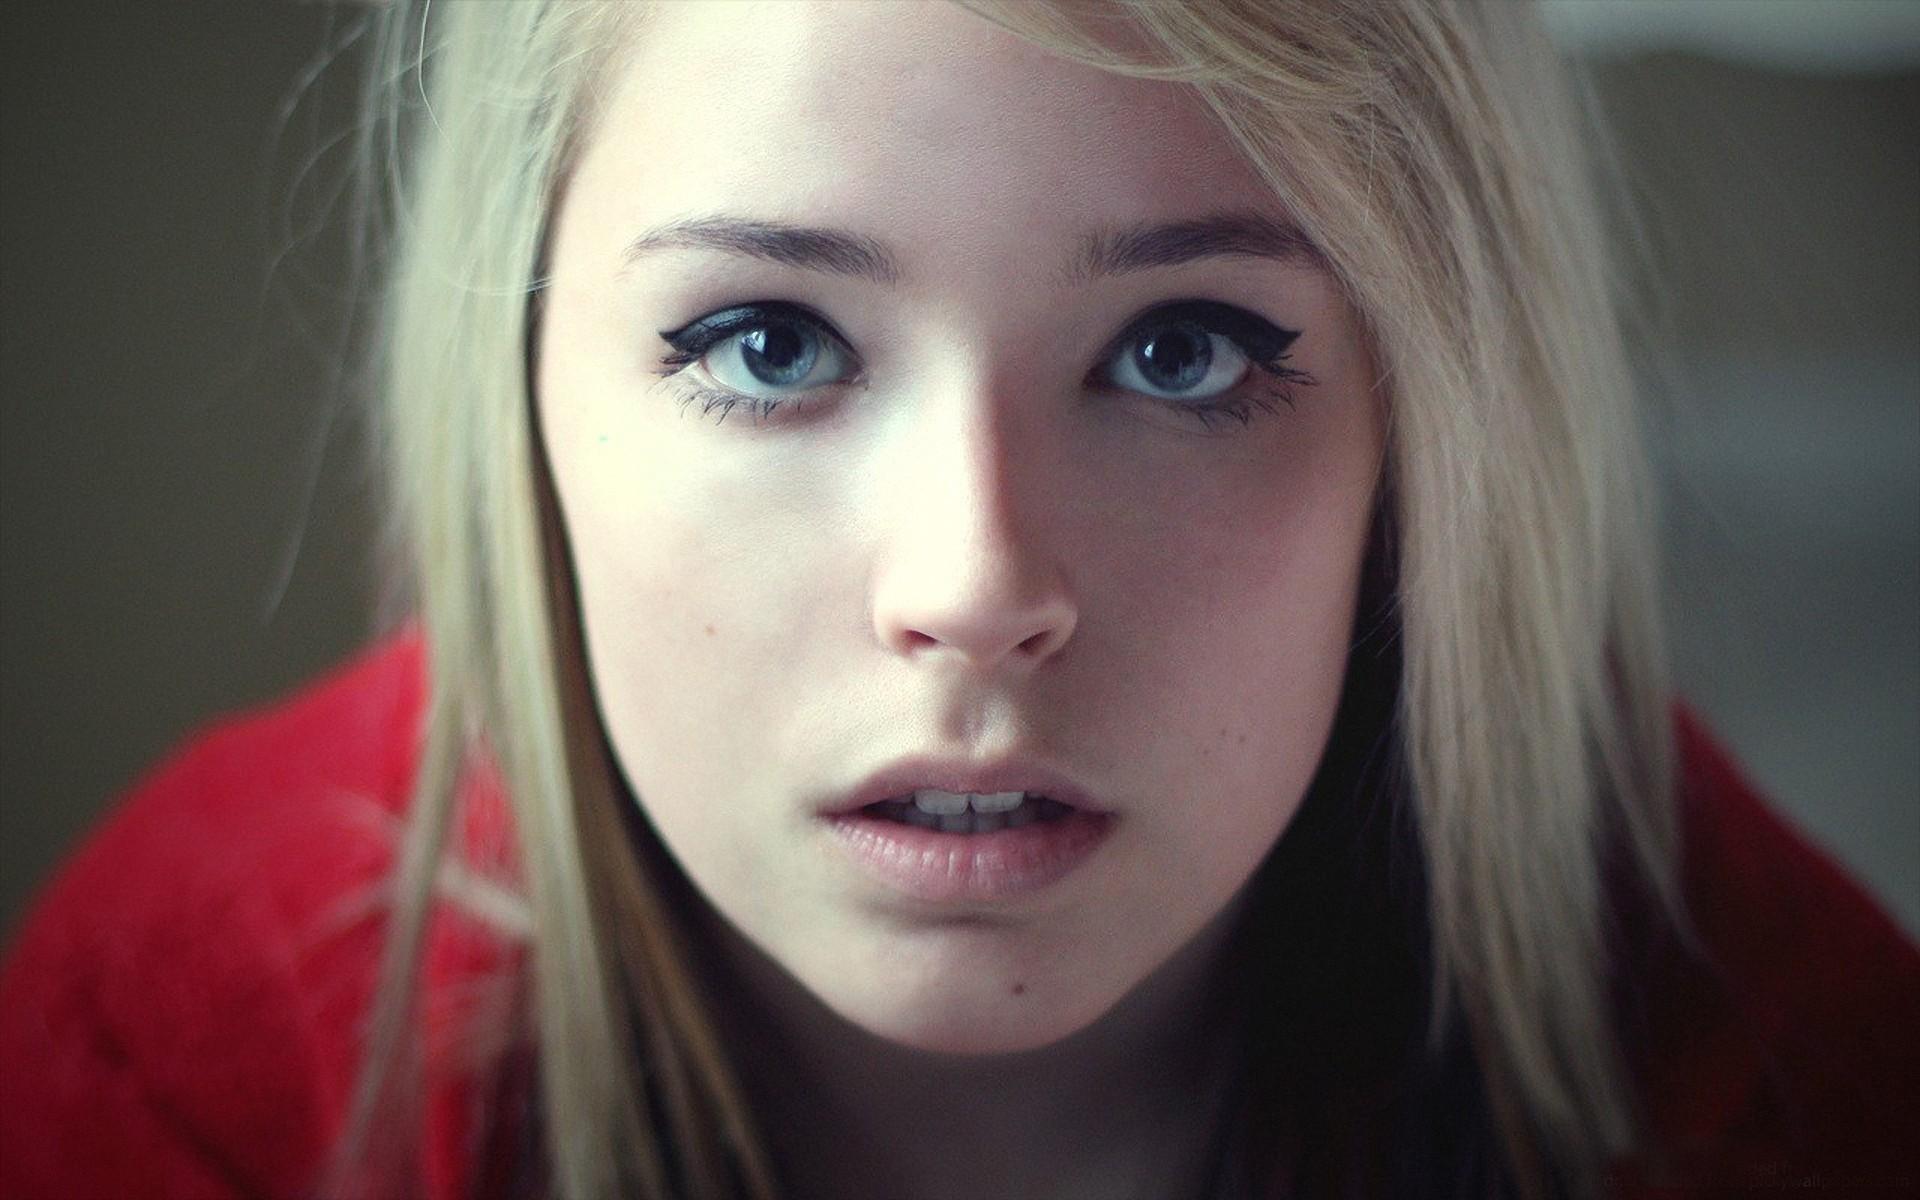 Beautiful Face Of Cute Girl Wallpaper | Characters-Women .